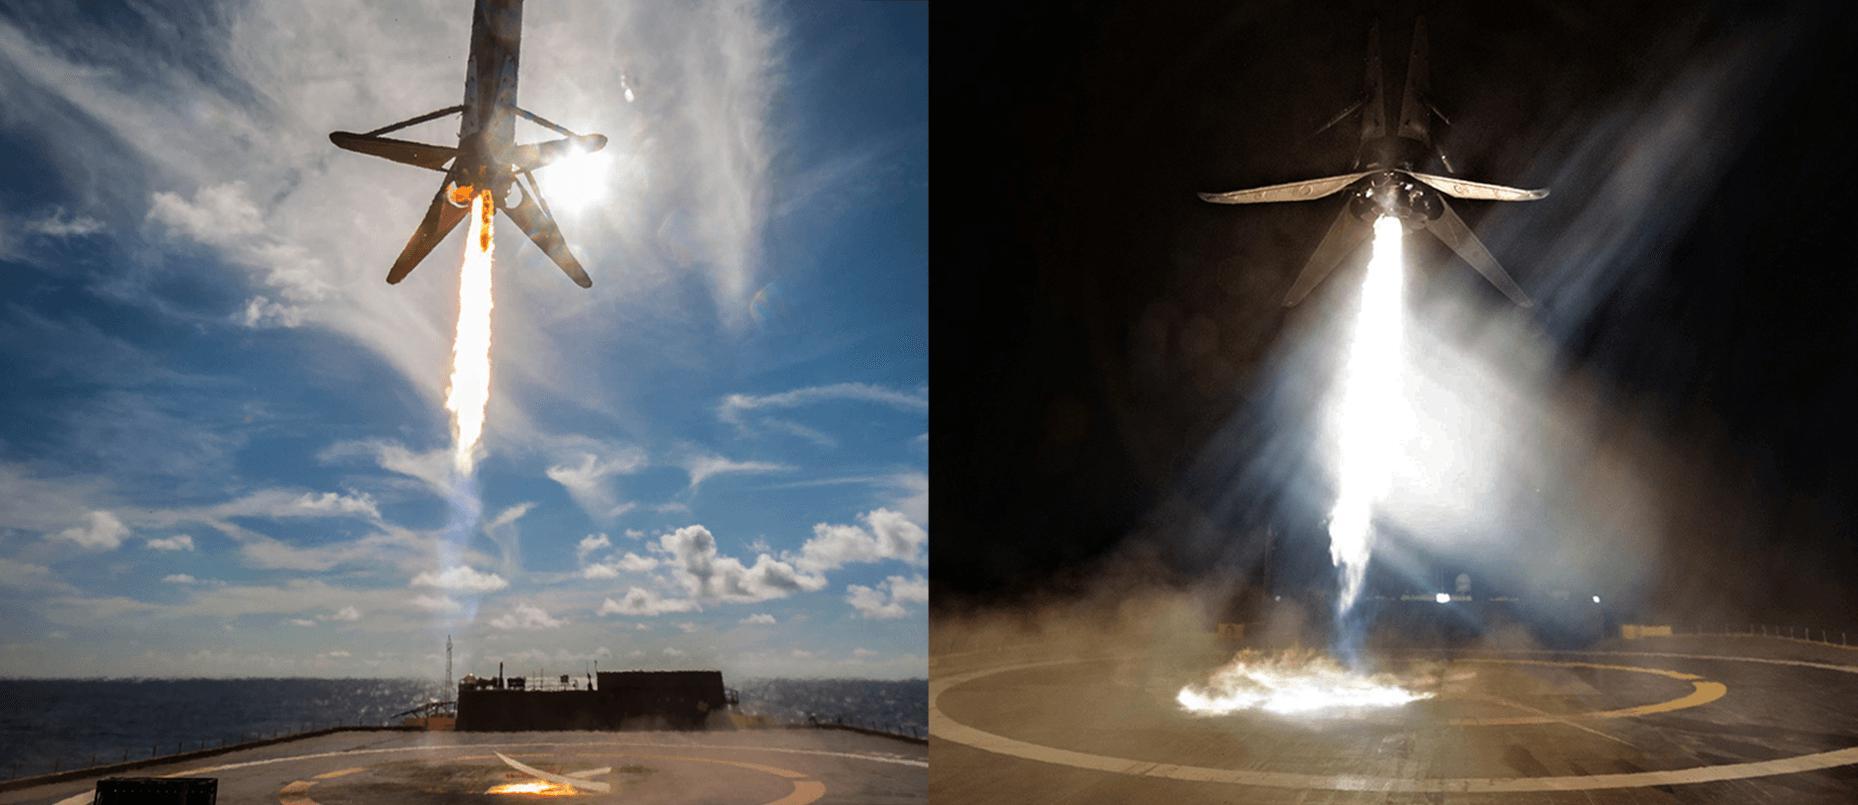 B1046 two landings – three months (SpaceX)